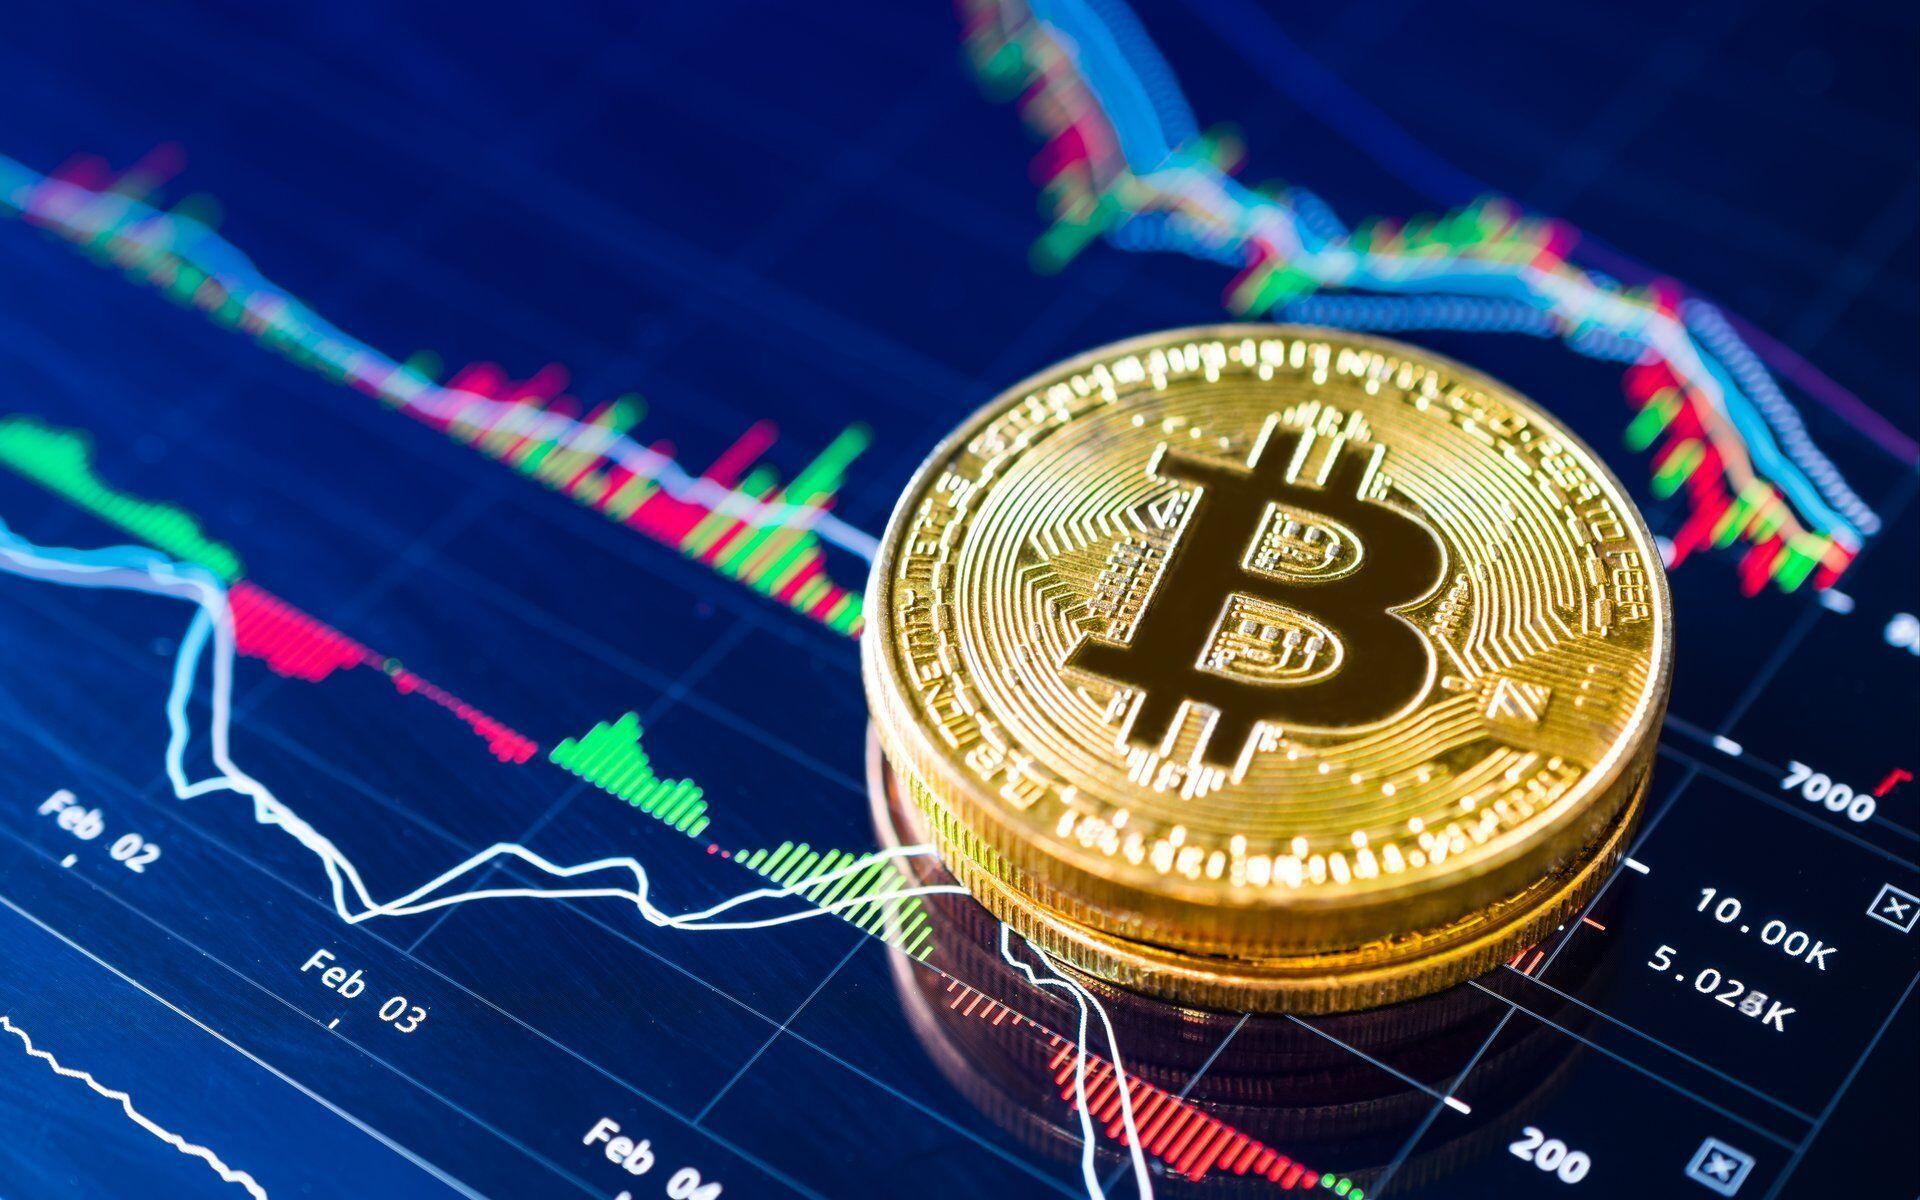 bot for forex trading bitcoin zelta ieguldjums